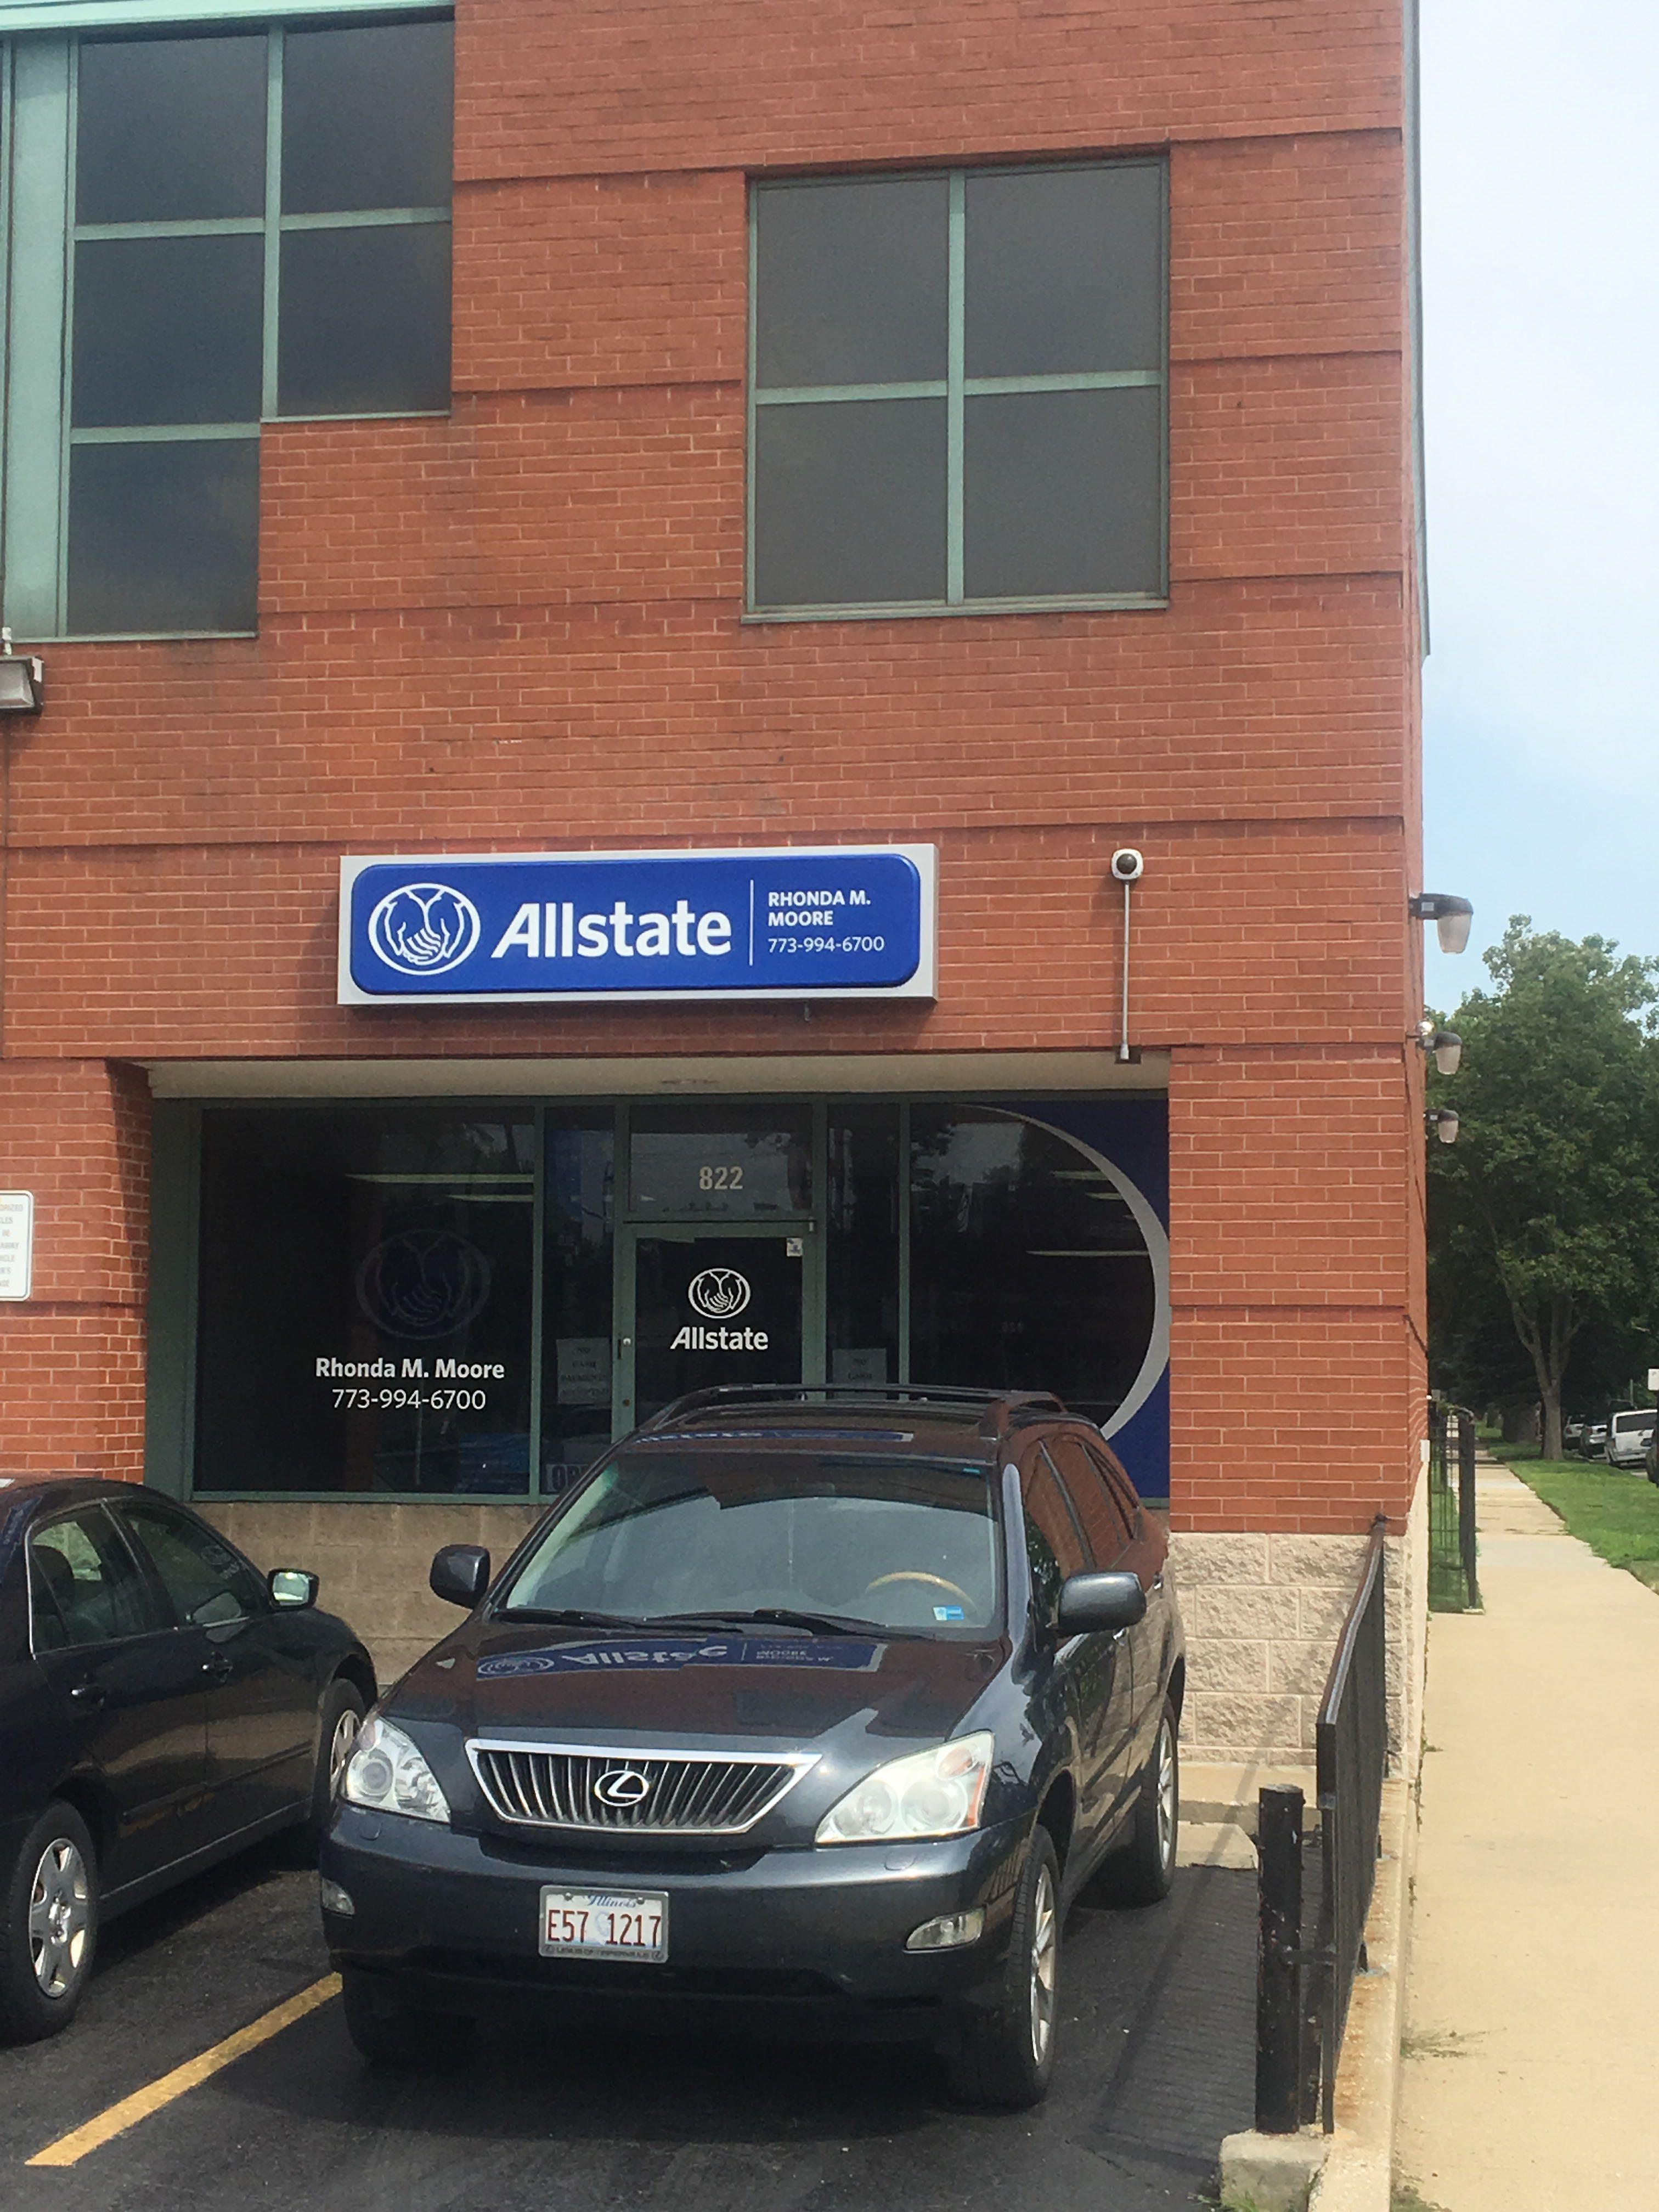 Allstate Insurance Agent Rhonda M Moore At 822 E 87th St